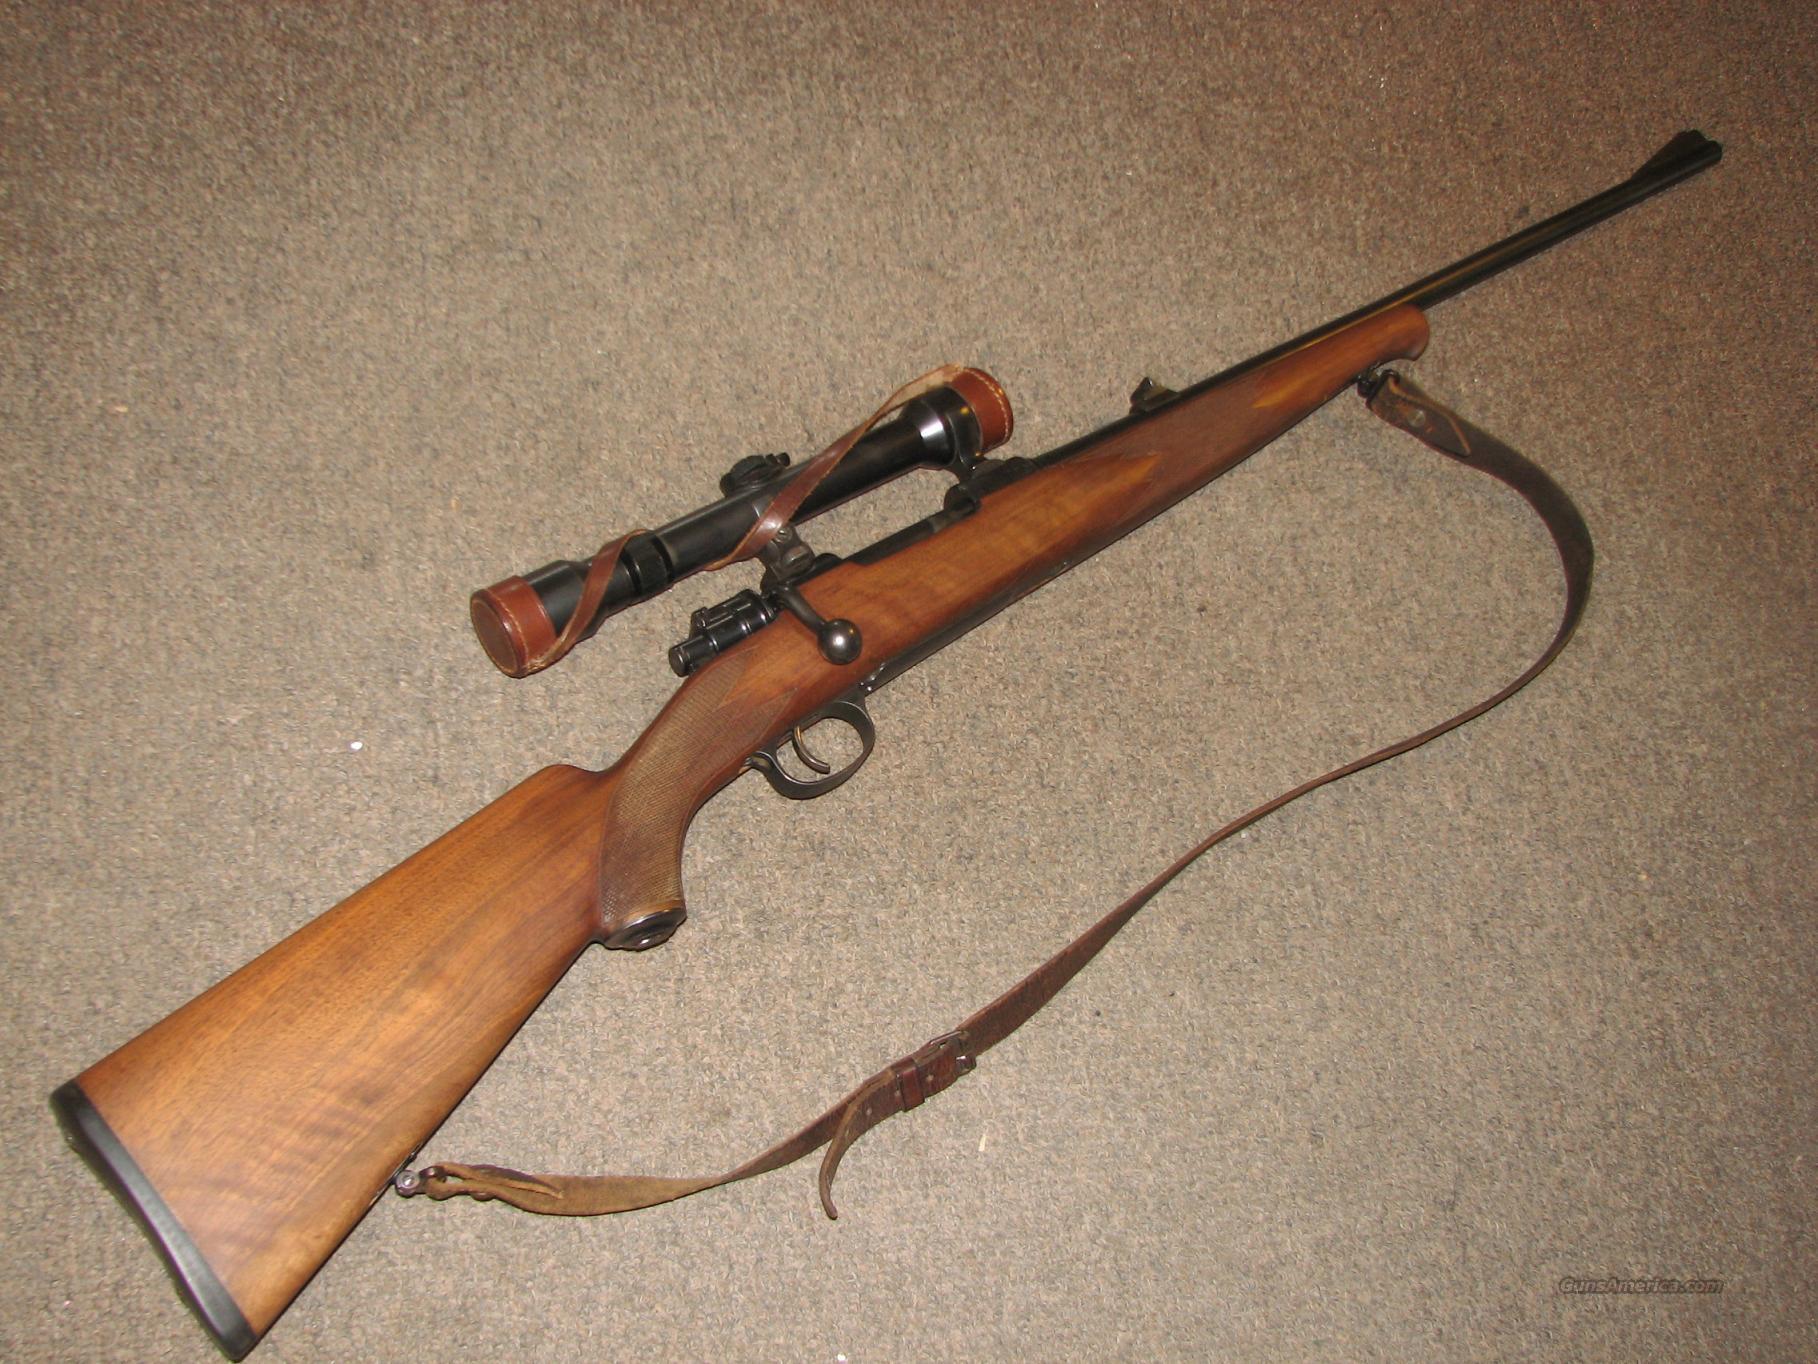 MAUSER 98 SPORTING RIFLE 8x57 w/ HENSOLDT SCOPE  Guns > Rifles > Mauser Rifles > German